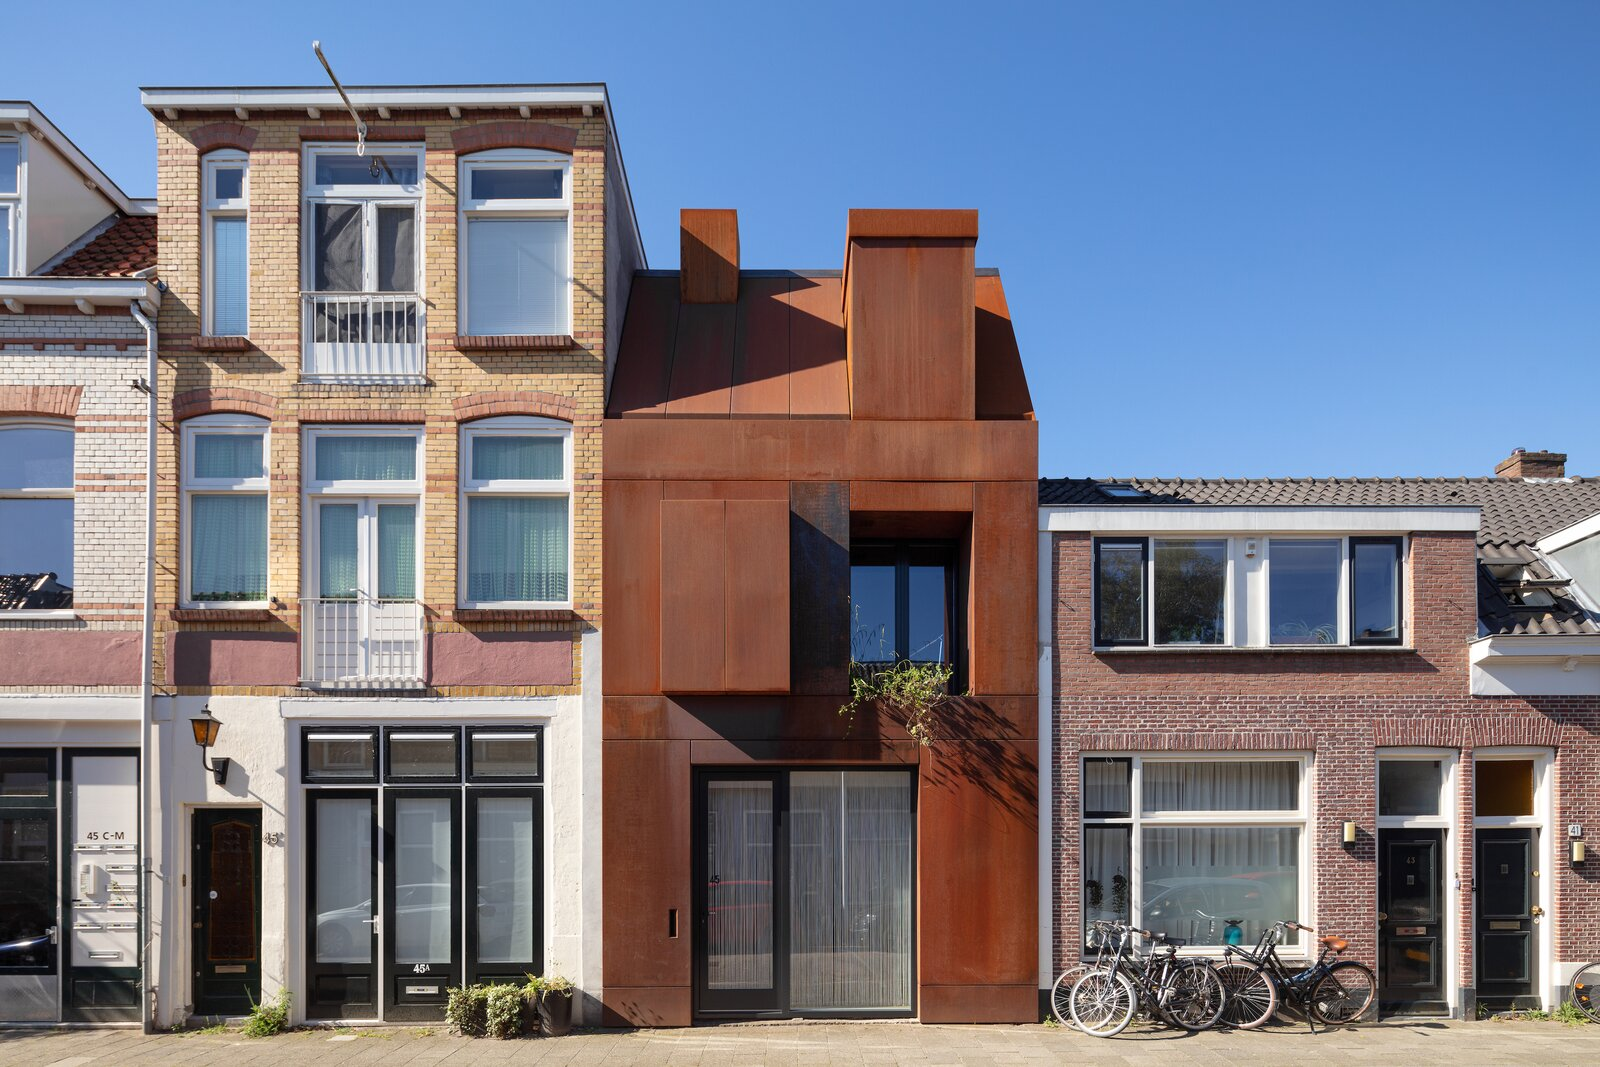 Steel Craft House exterior